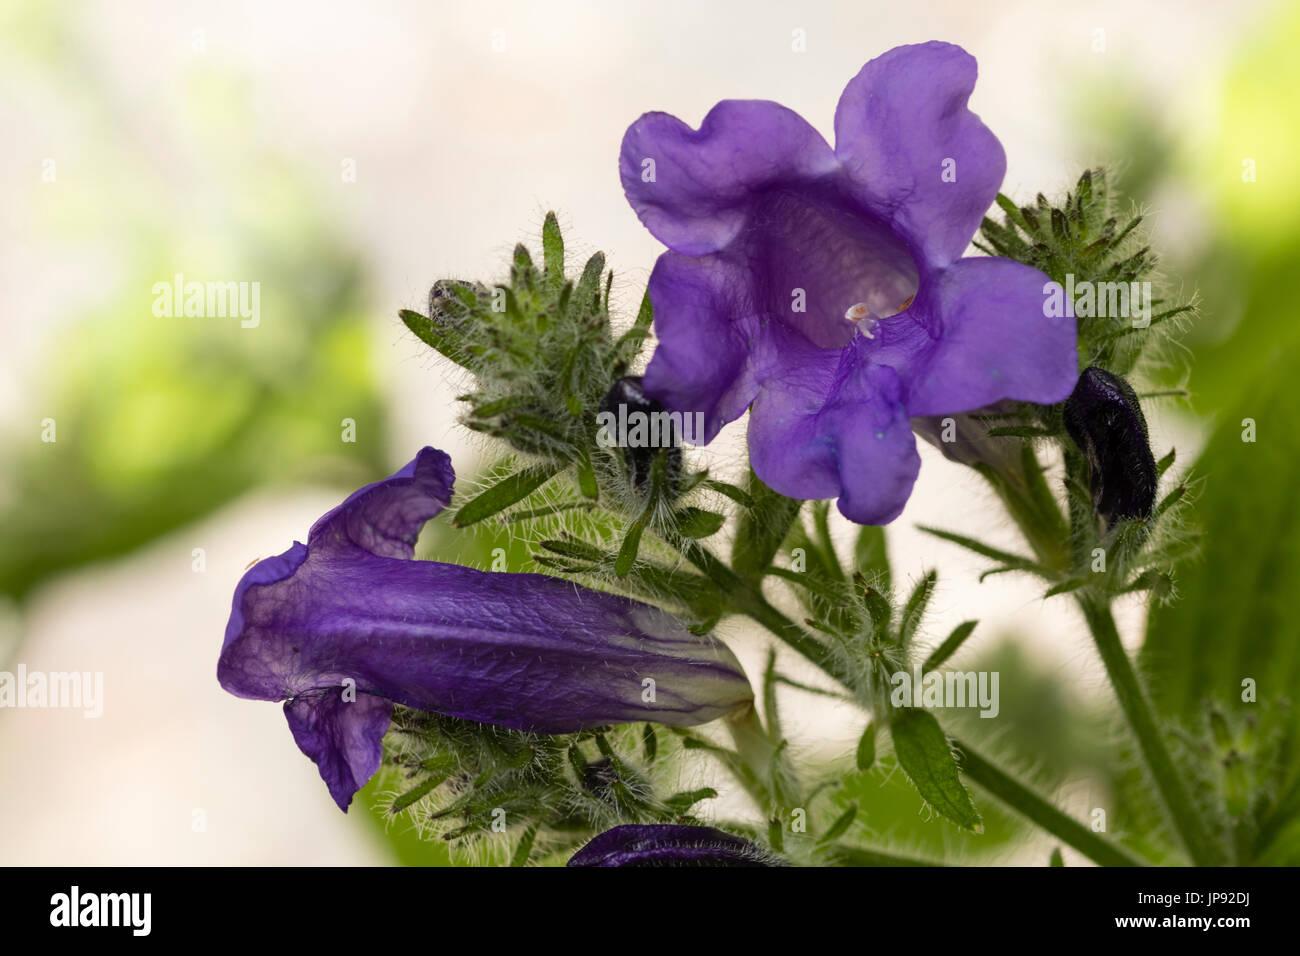 herbaceous stockfotos herbaceous bilder alamy. Black Bedroom Furniture Sets. Home Design Ideas